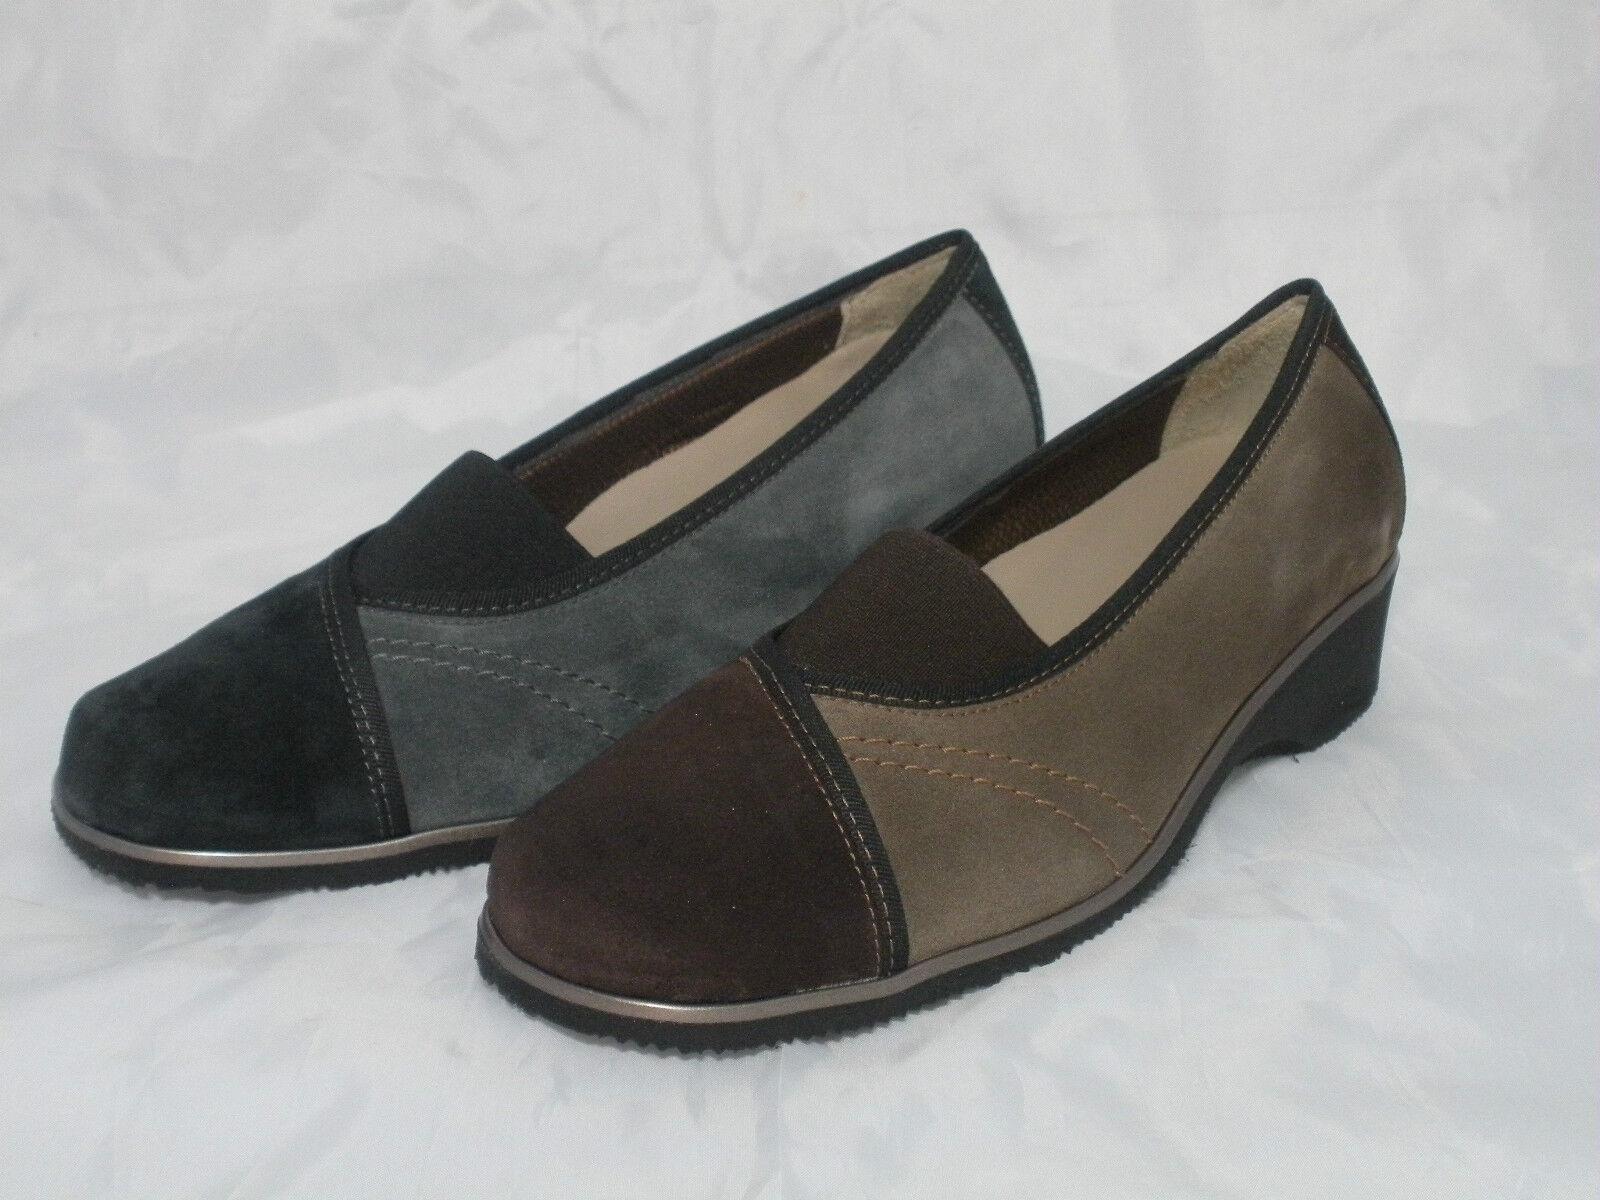 chaussures MELLUSO femmes MOCASSINI SCAMOSCIATI K90602 noir-ANTRACITE E CAFFE'-VISONE